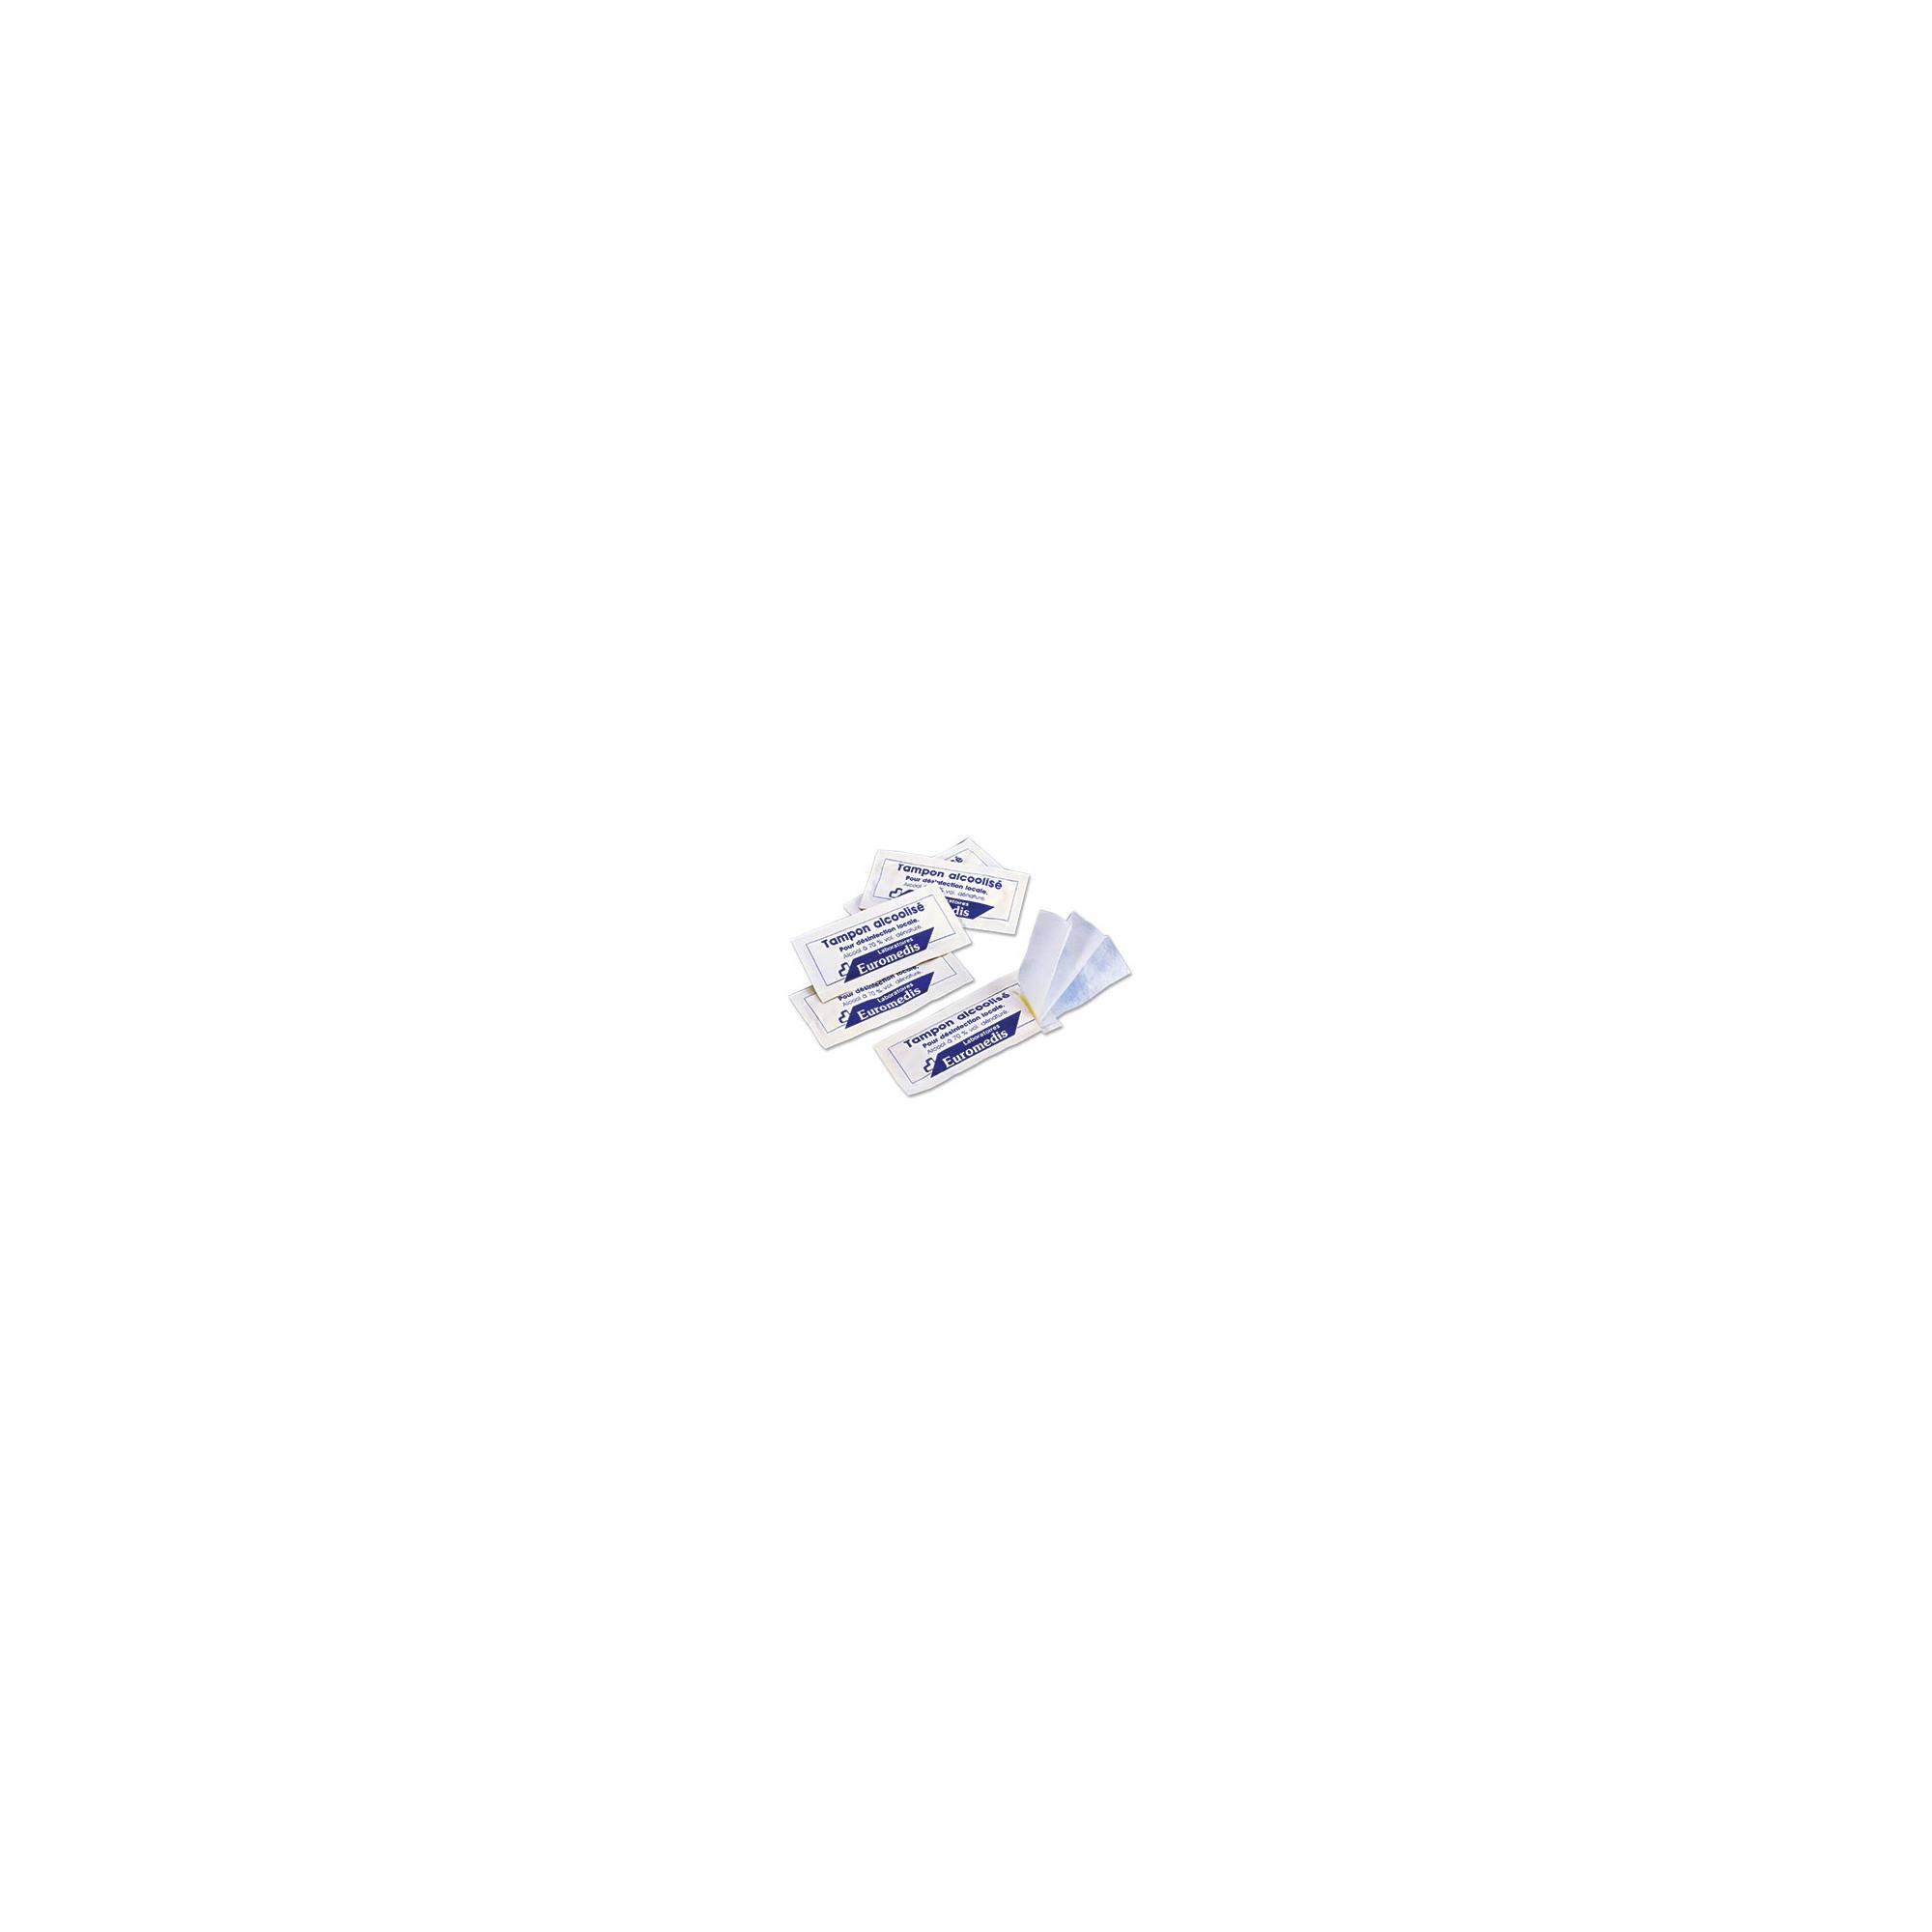 Tampon Alcool 70° - Boîte de 100